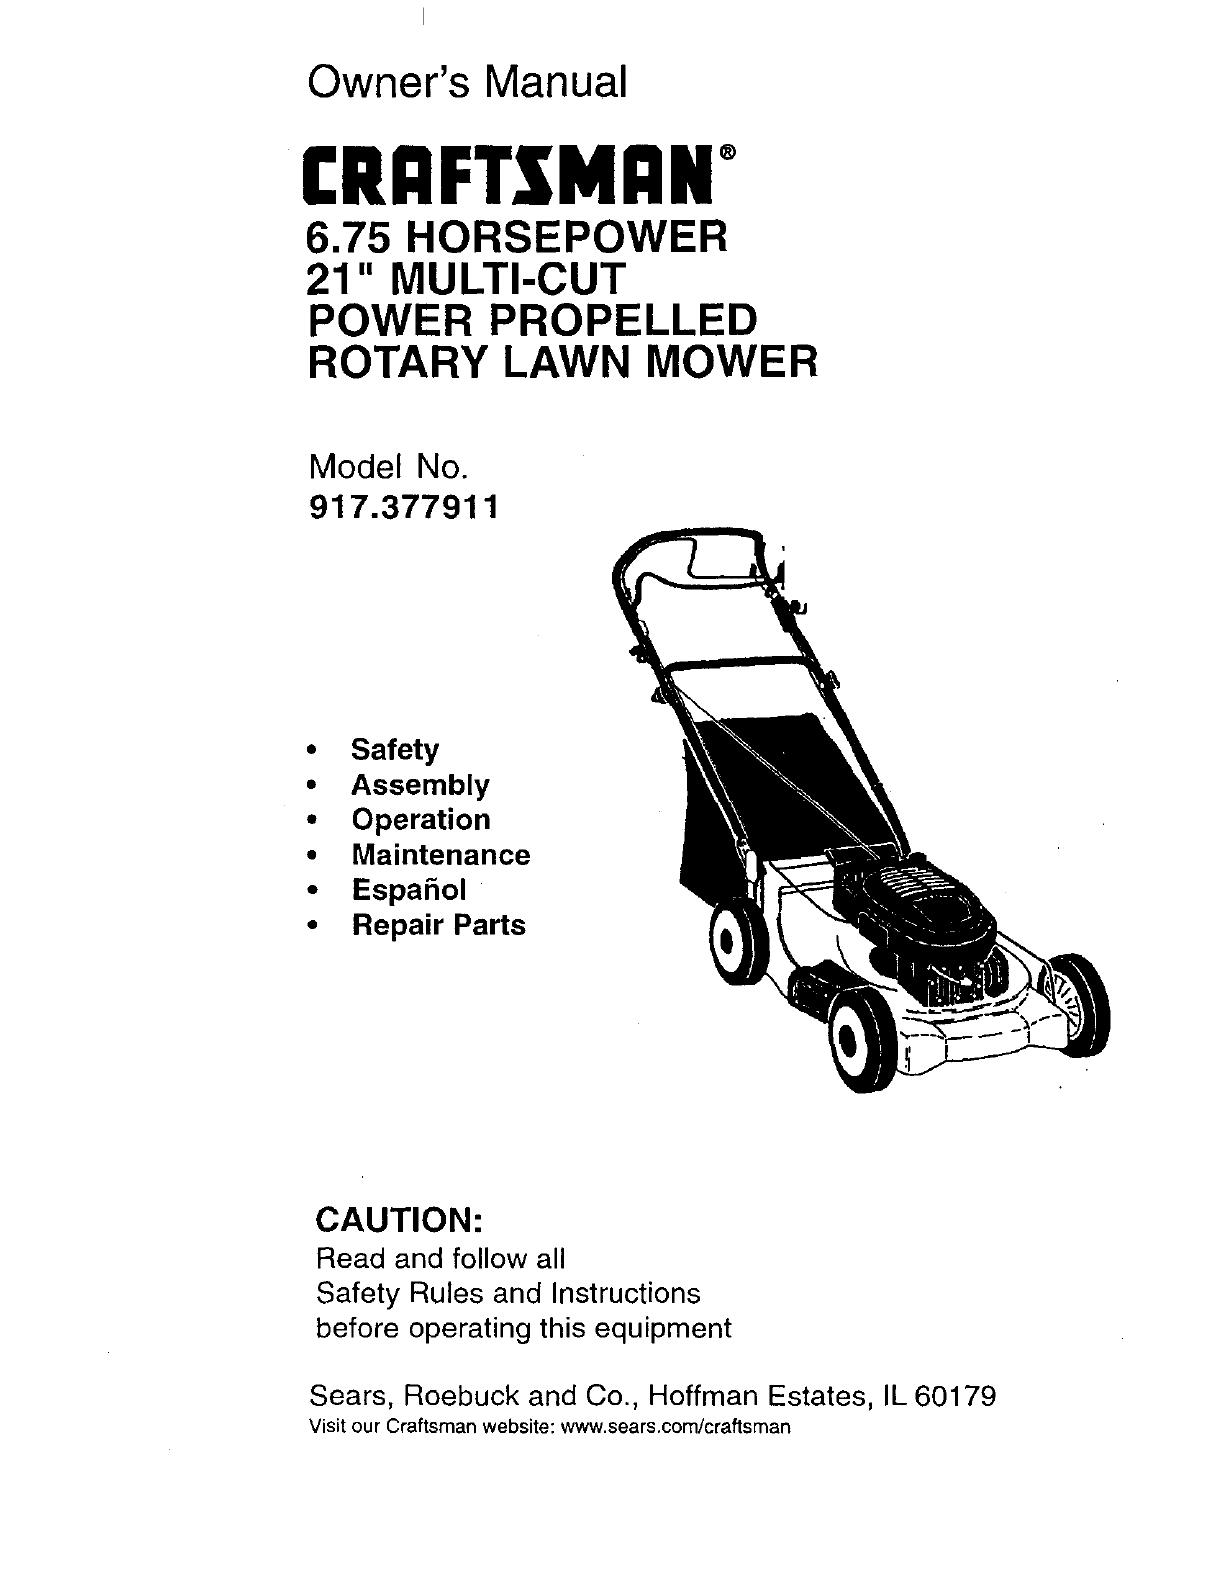 Craftsman 917377911 User Manual 6 75hp 21 Rotary Lawn Mower